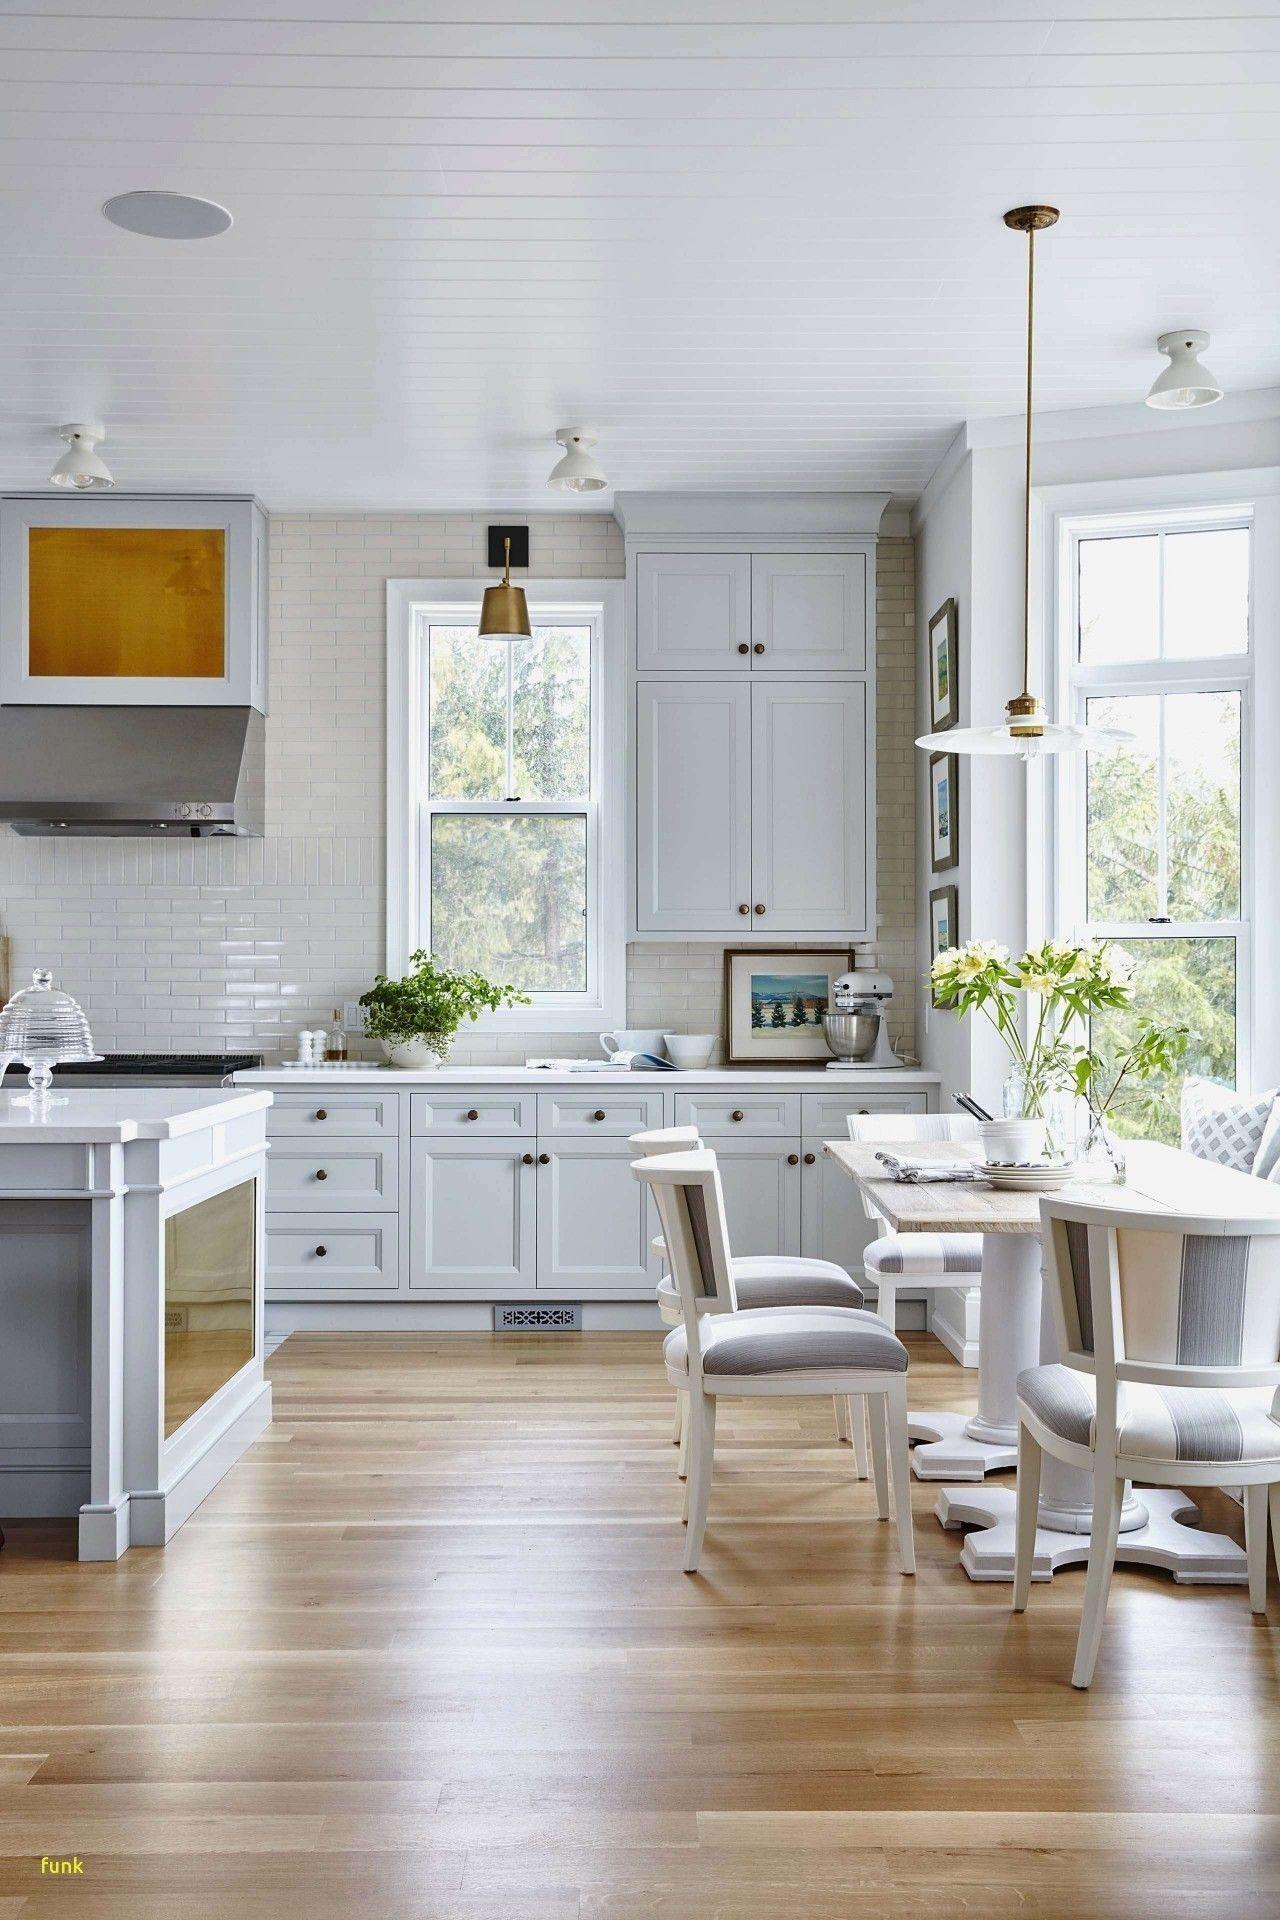 11 elegante lichte houten keukenkasten keuken met lichte ...